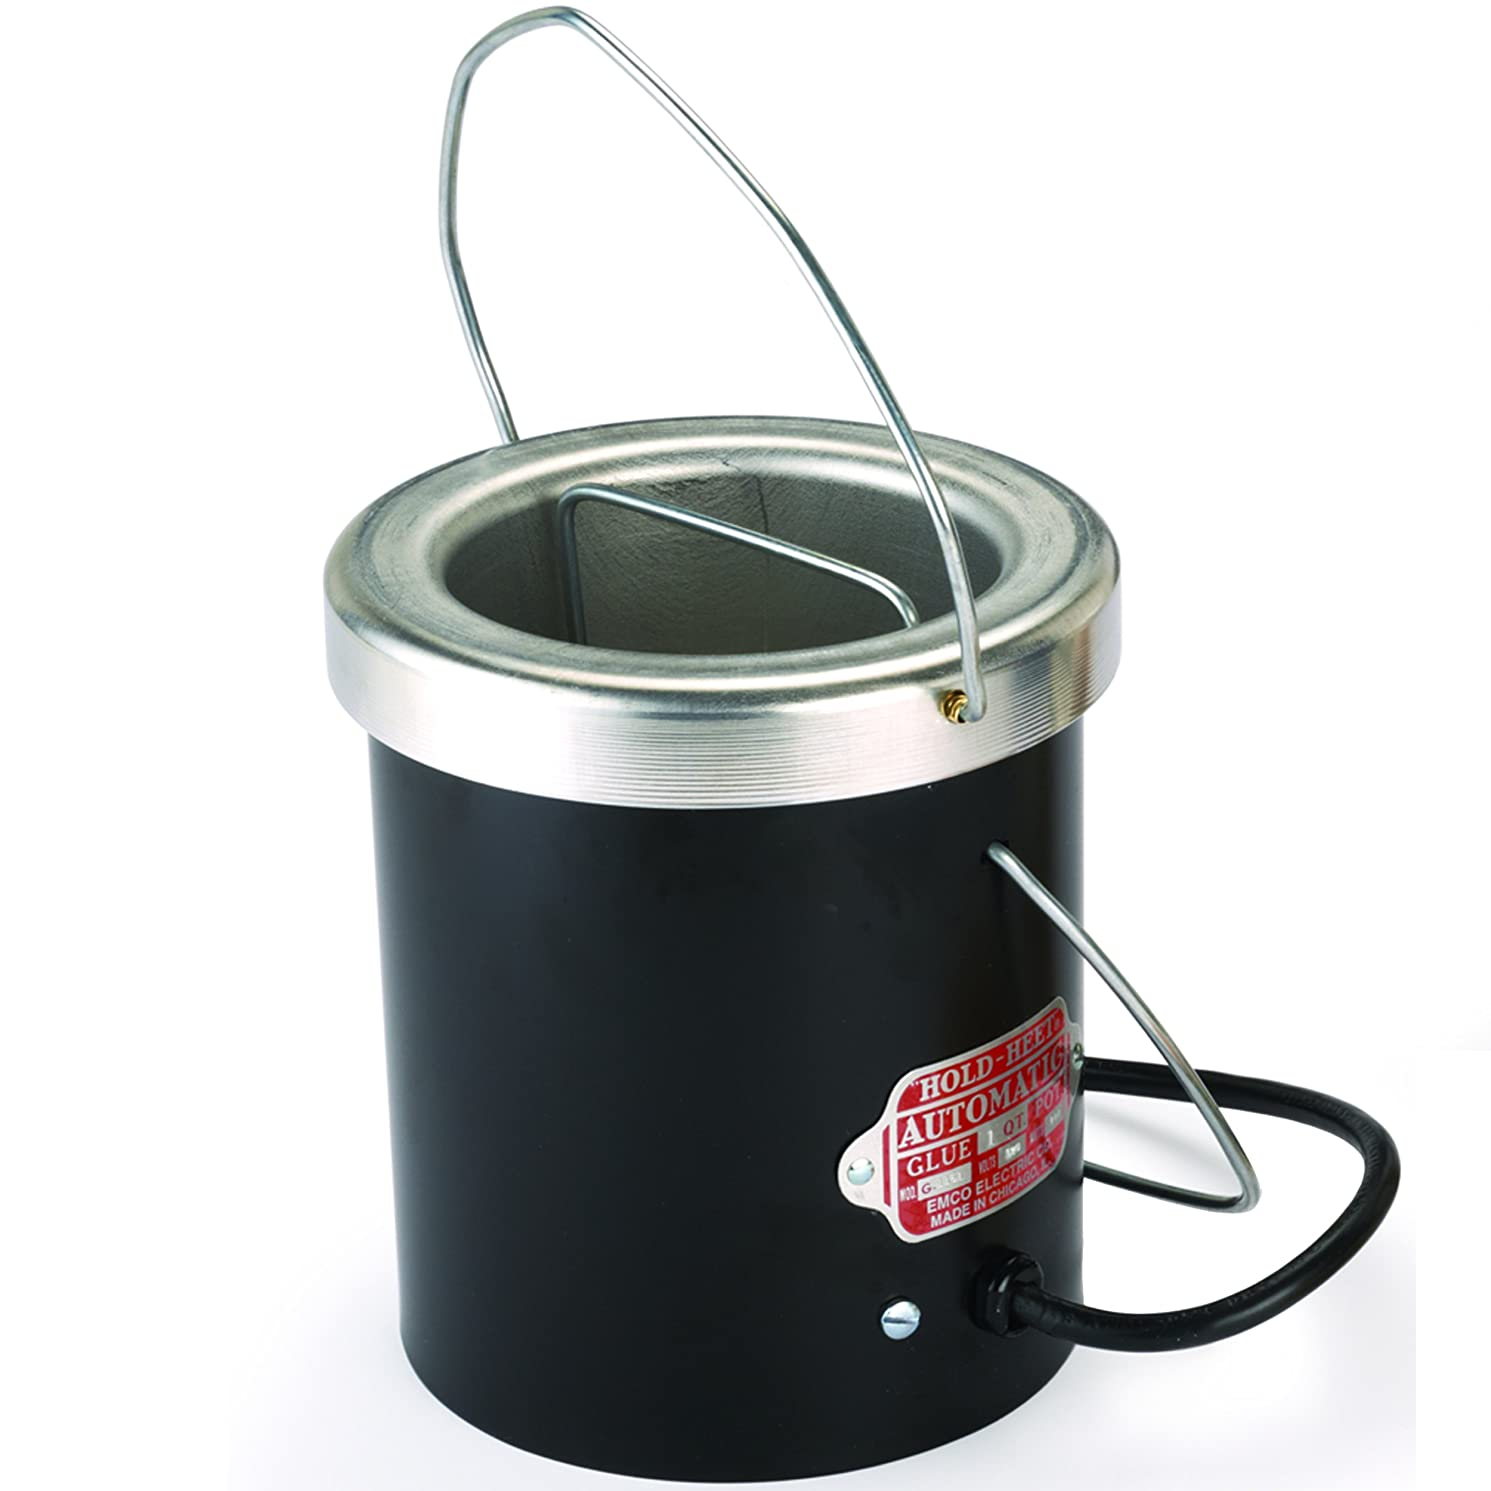 Hold Heet Electric Glue Pot, 1 Quart